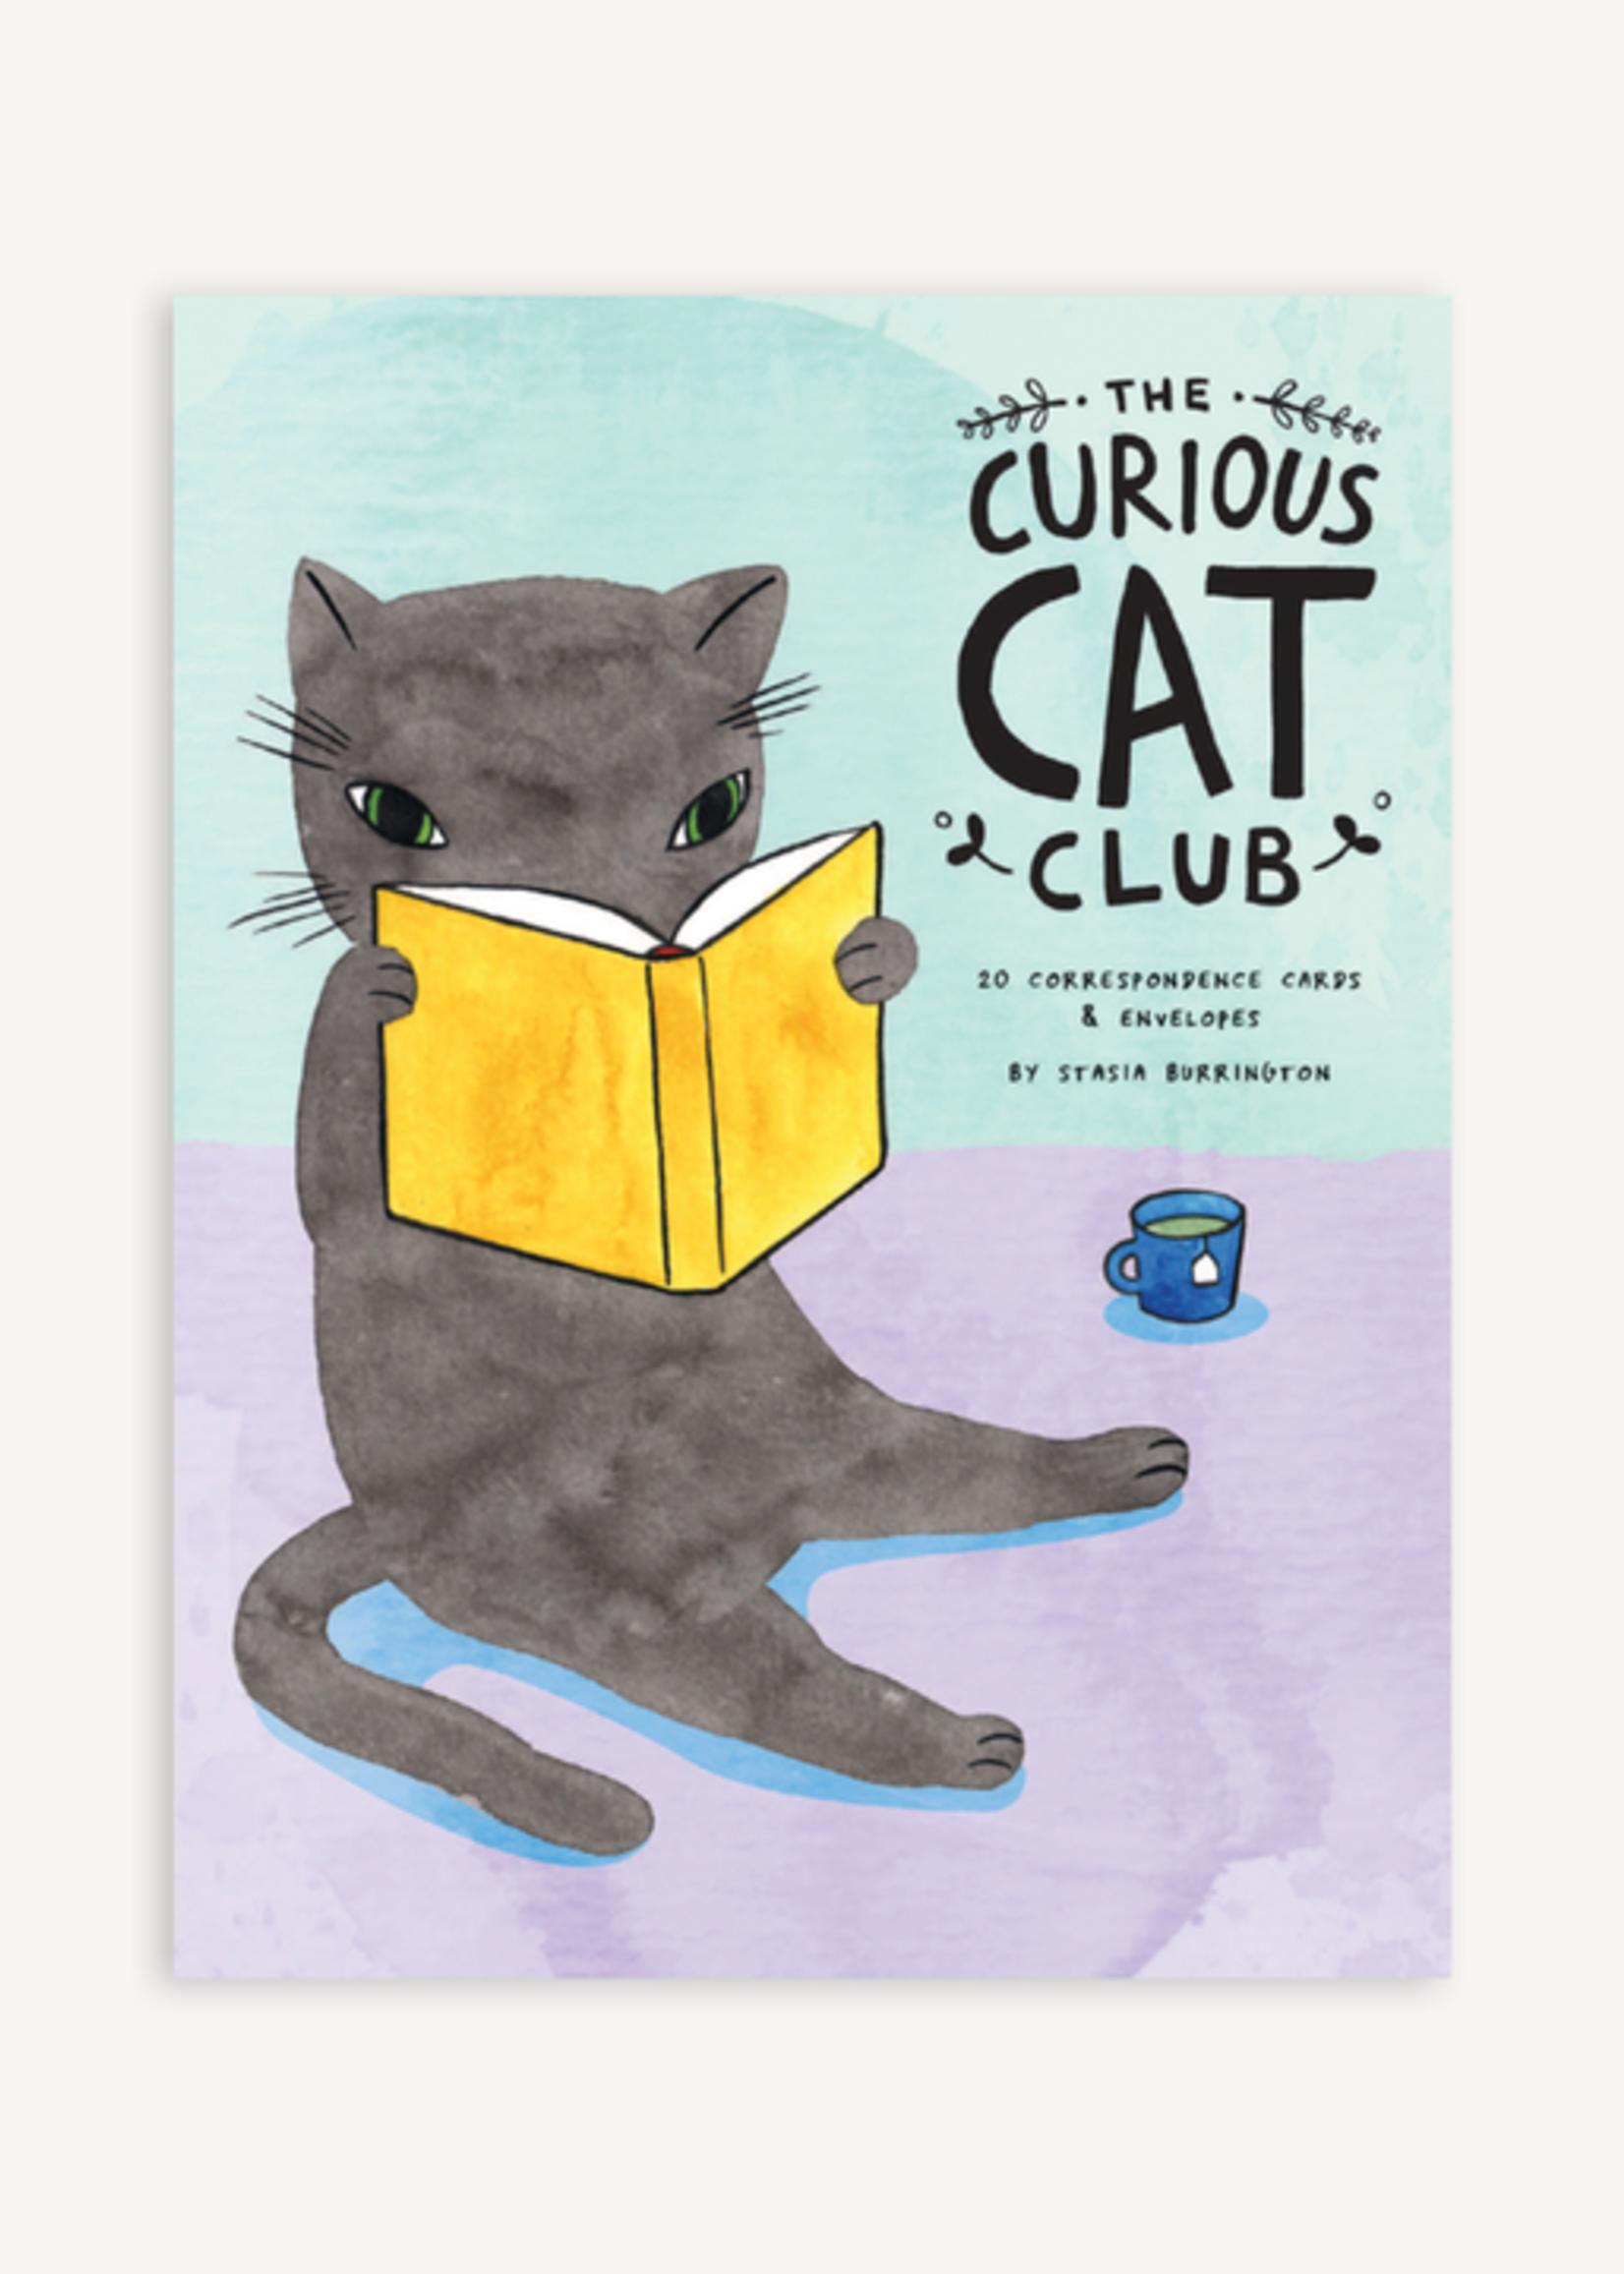 The Curious Cat Club Correspondence Cards by Stasia Burrington